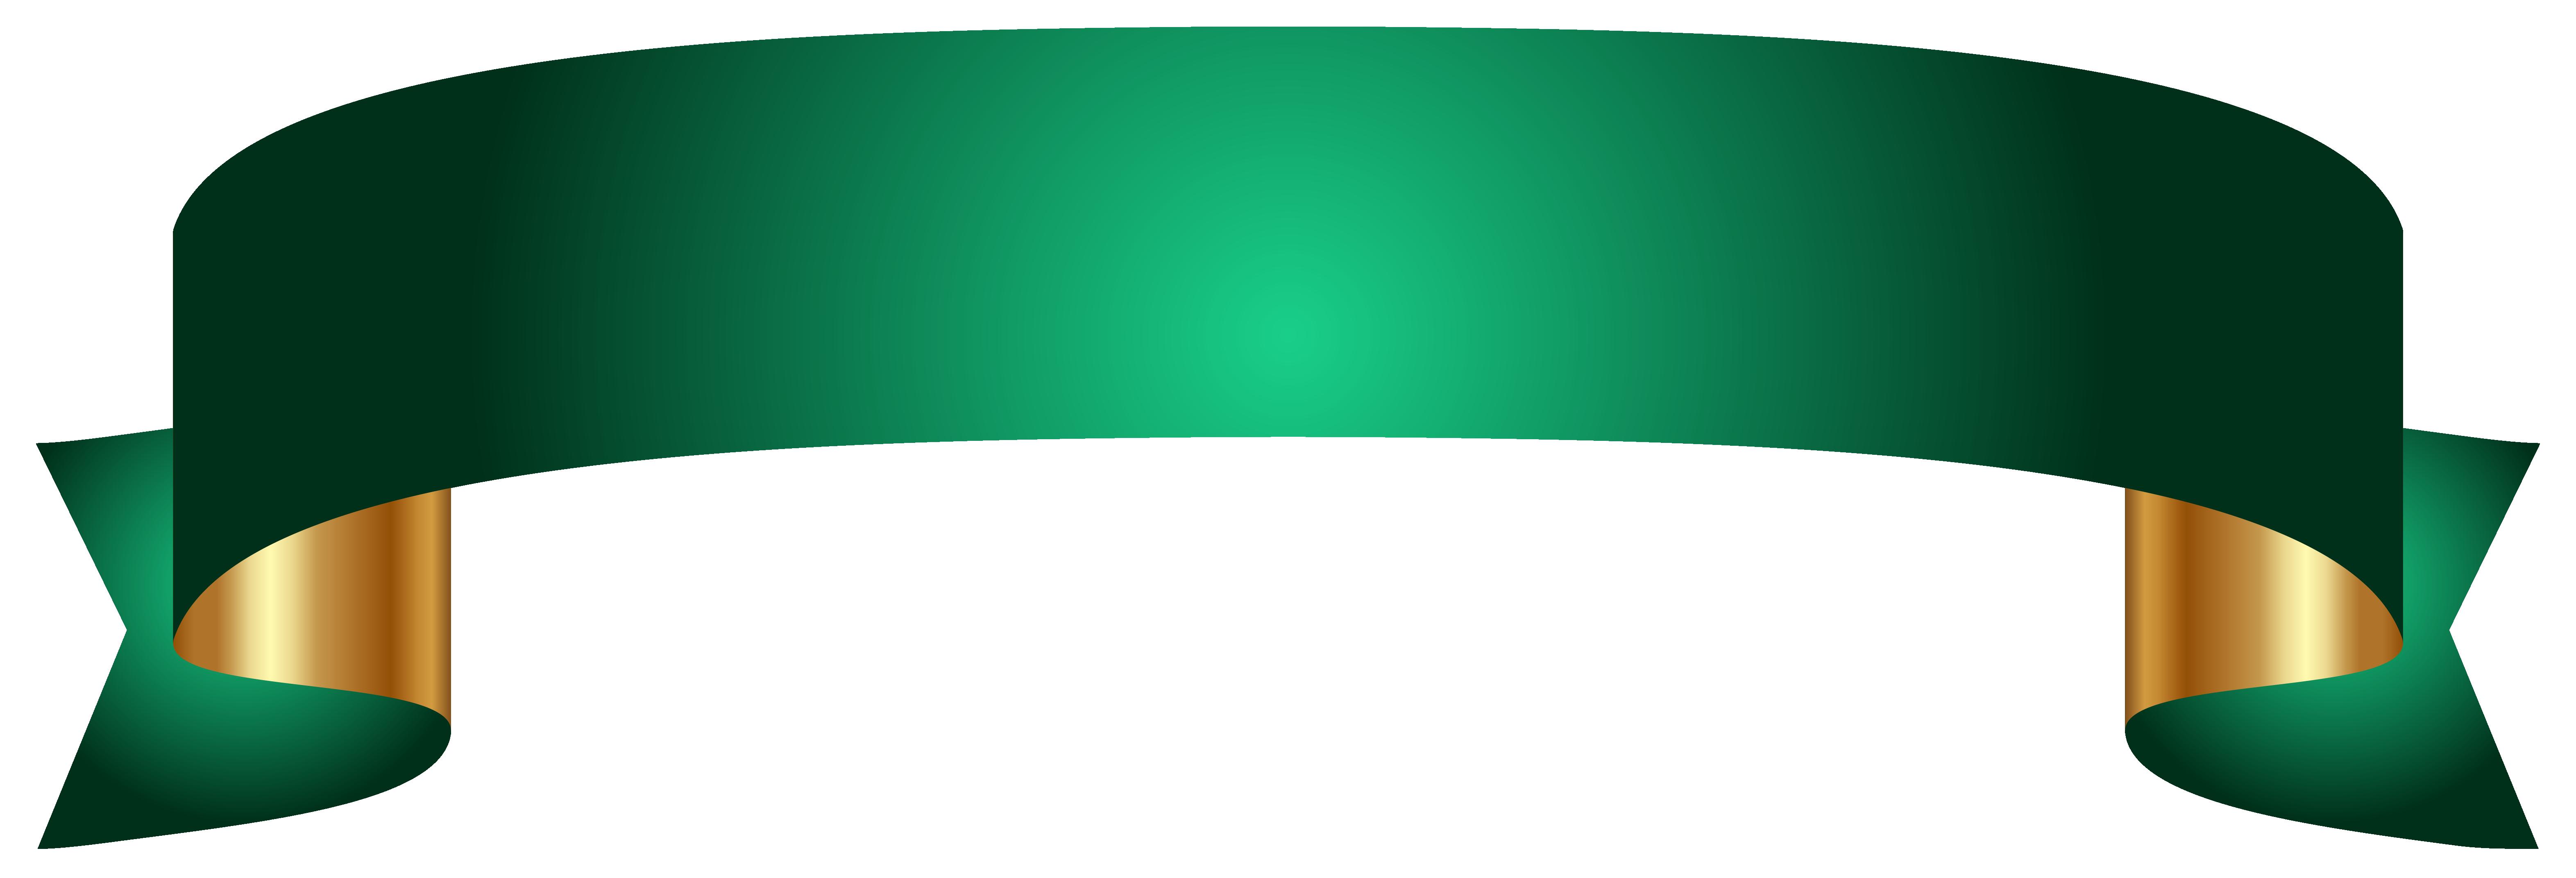 Transparent png images. Green banner clip art